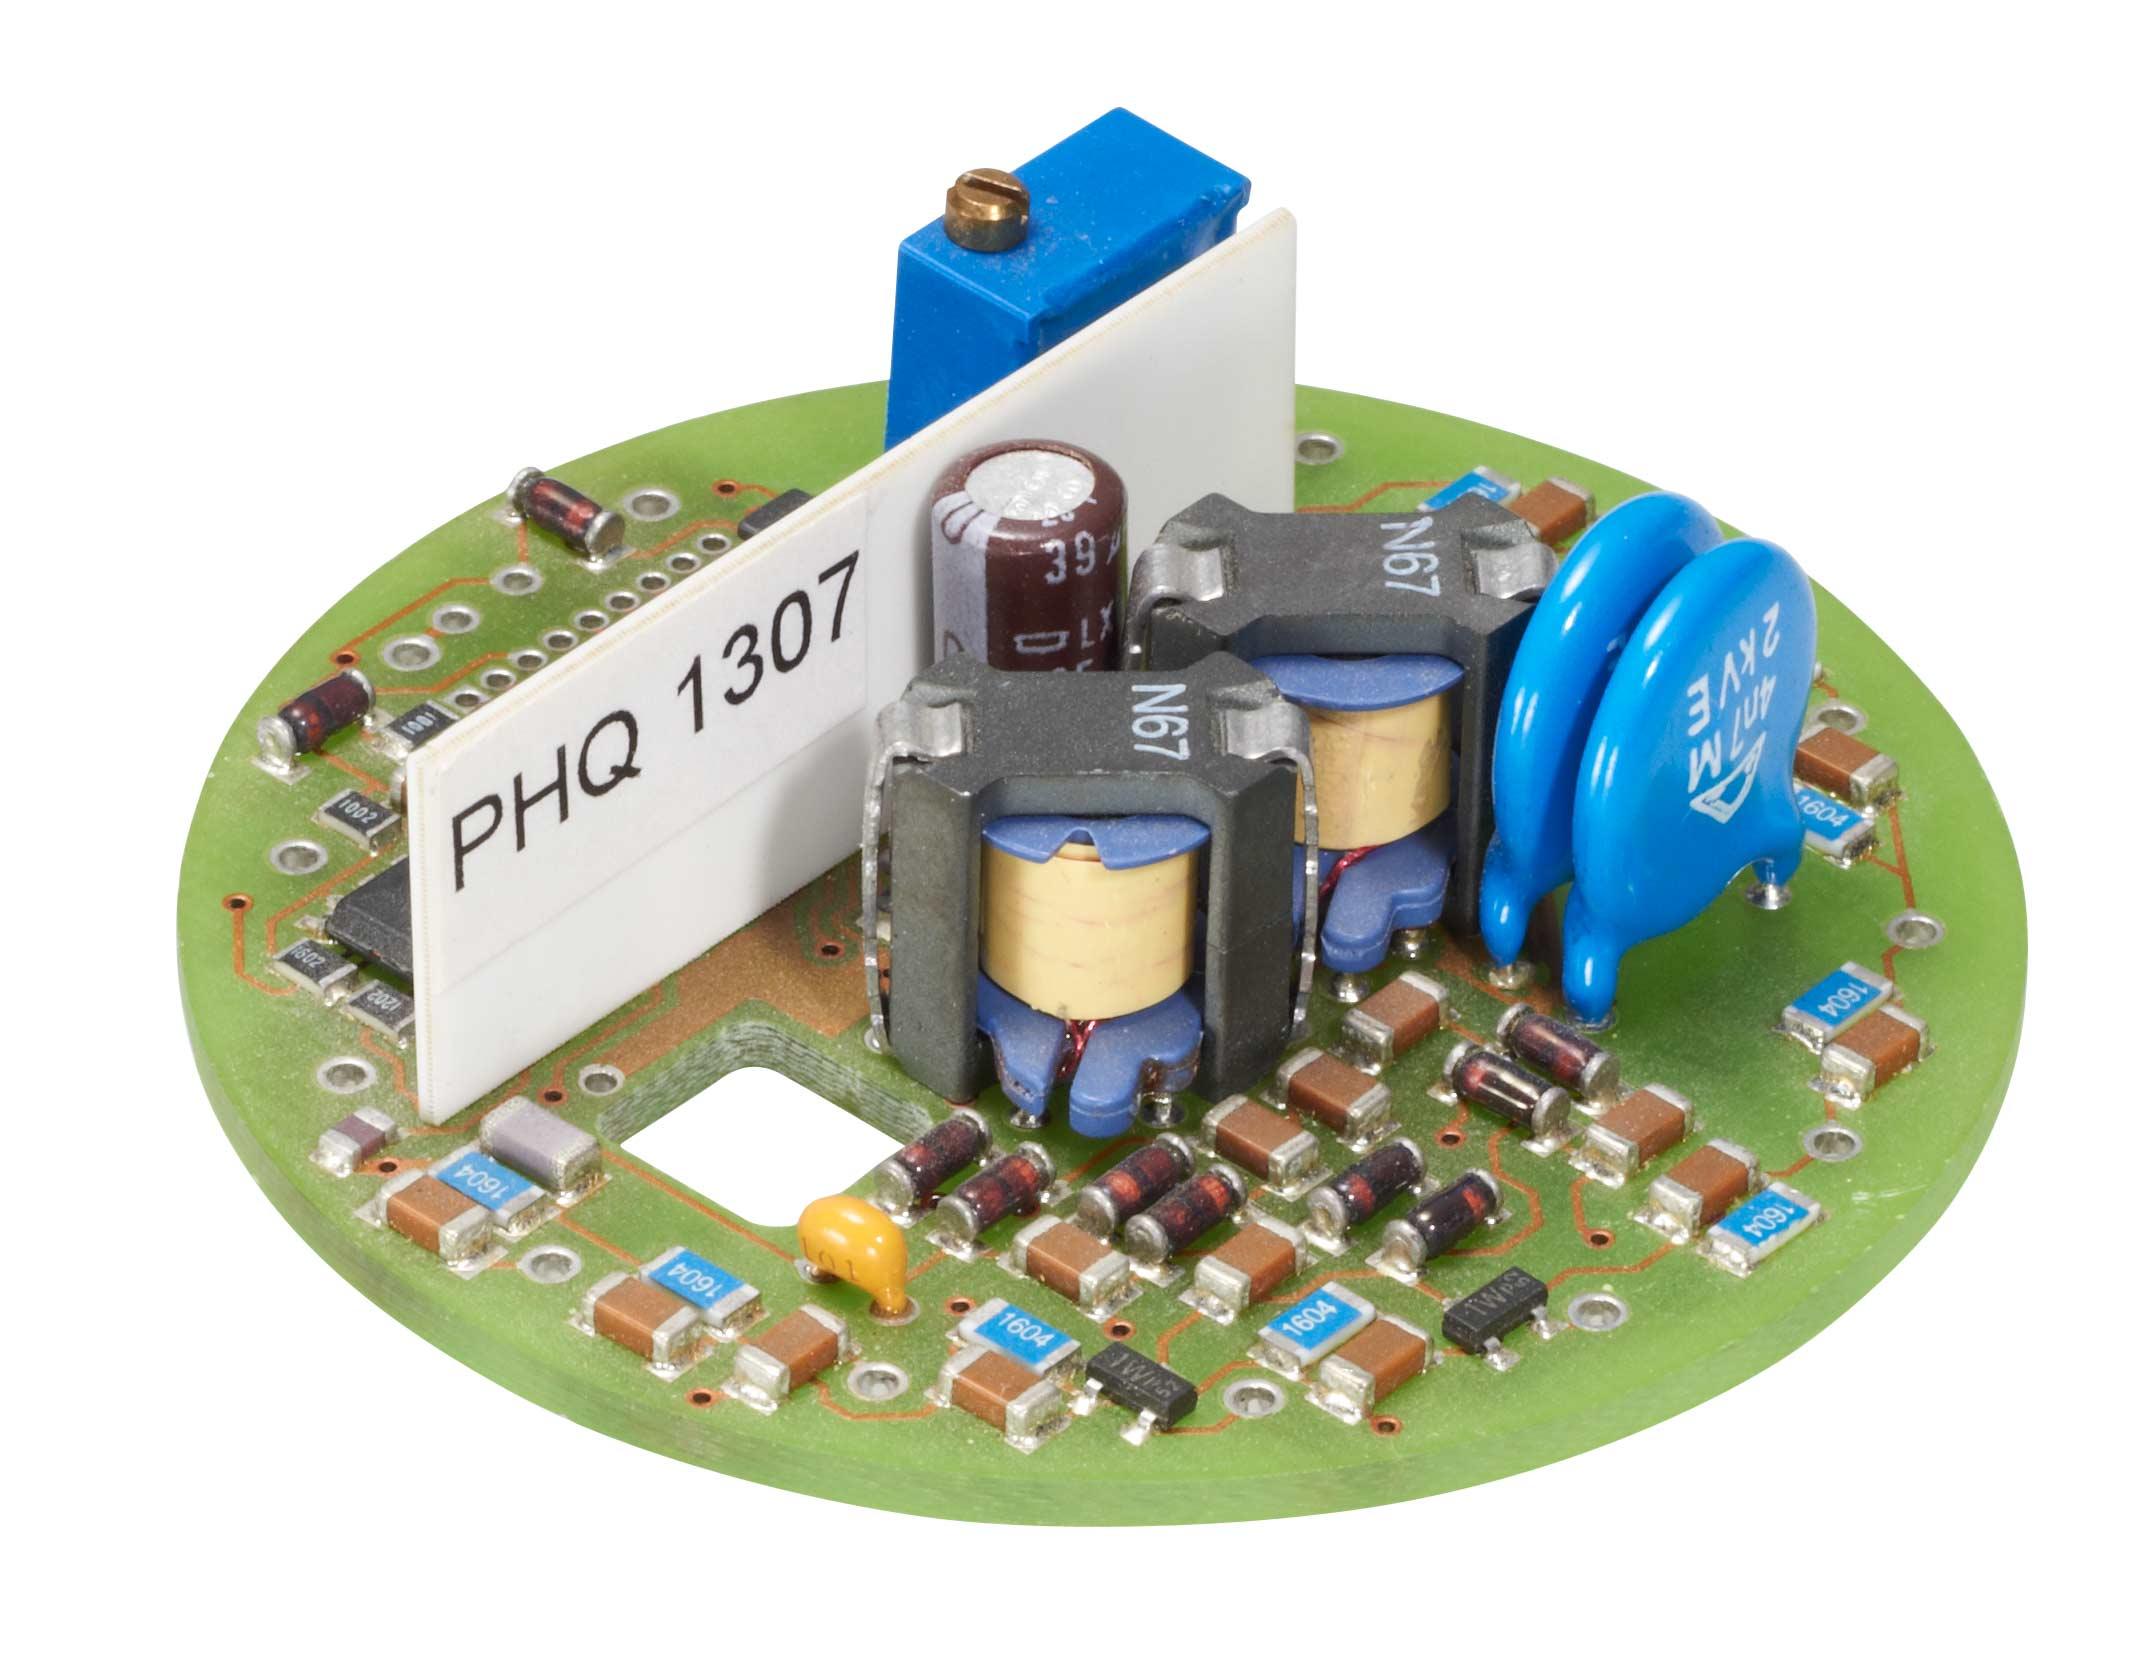 Convertisseur haute tension DC PHQ 1307 ISEG